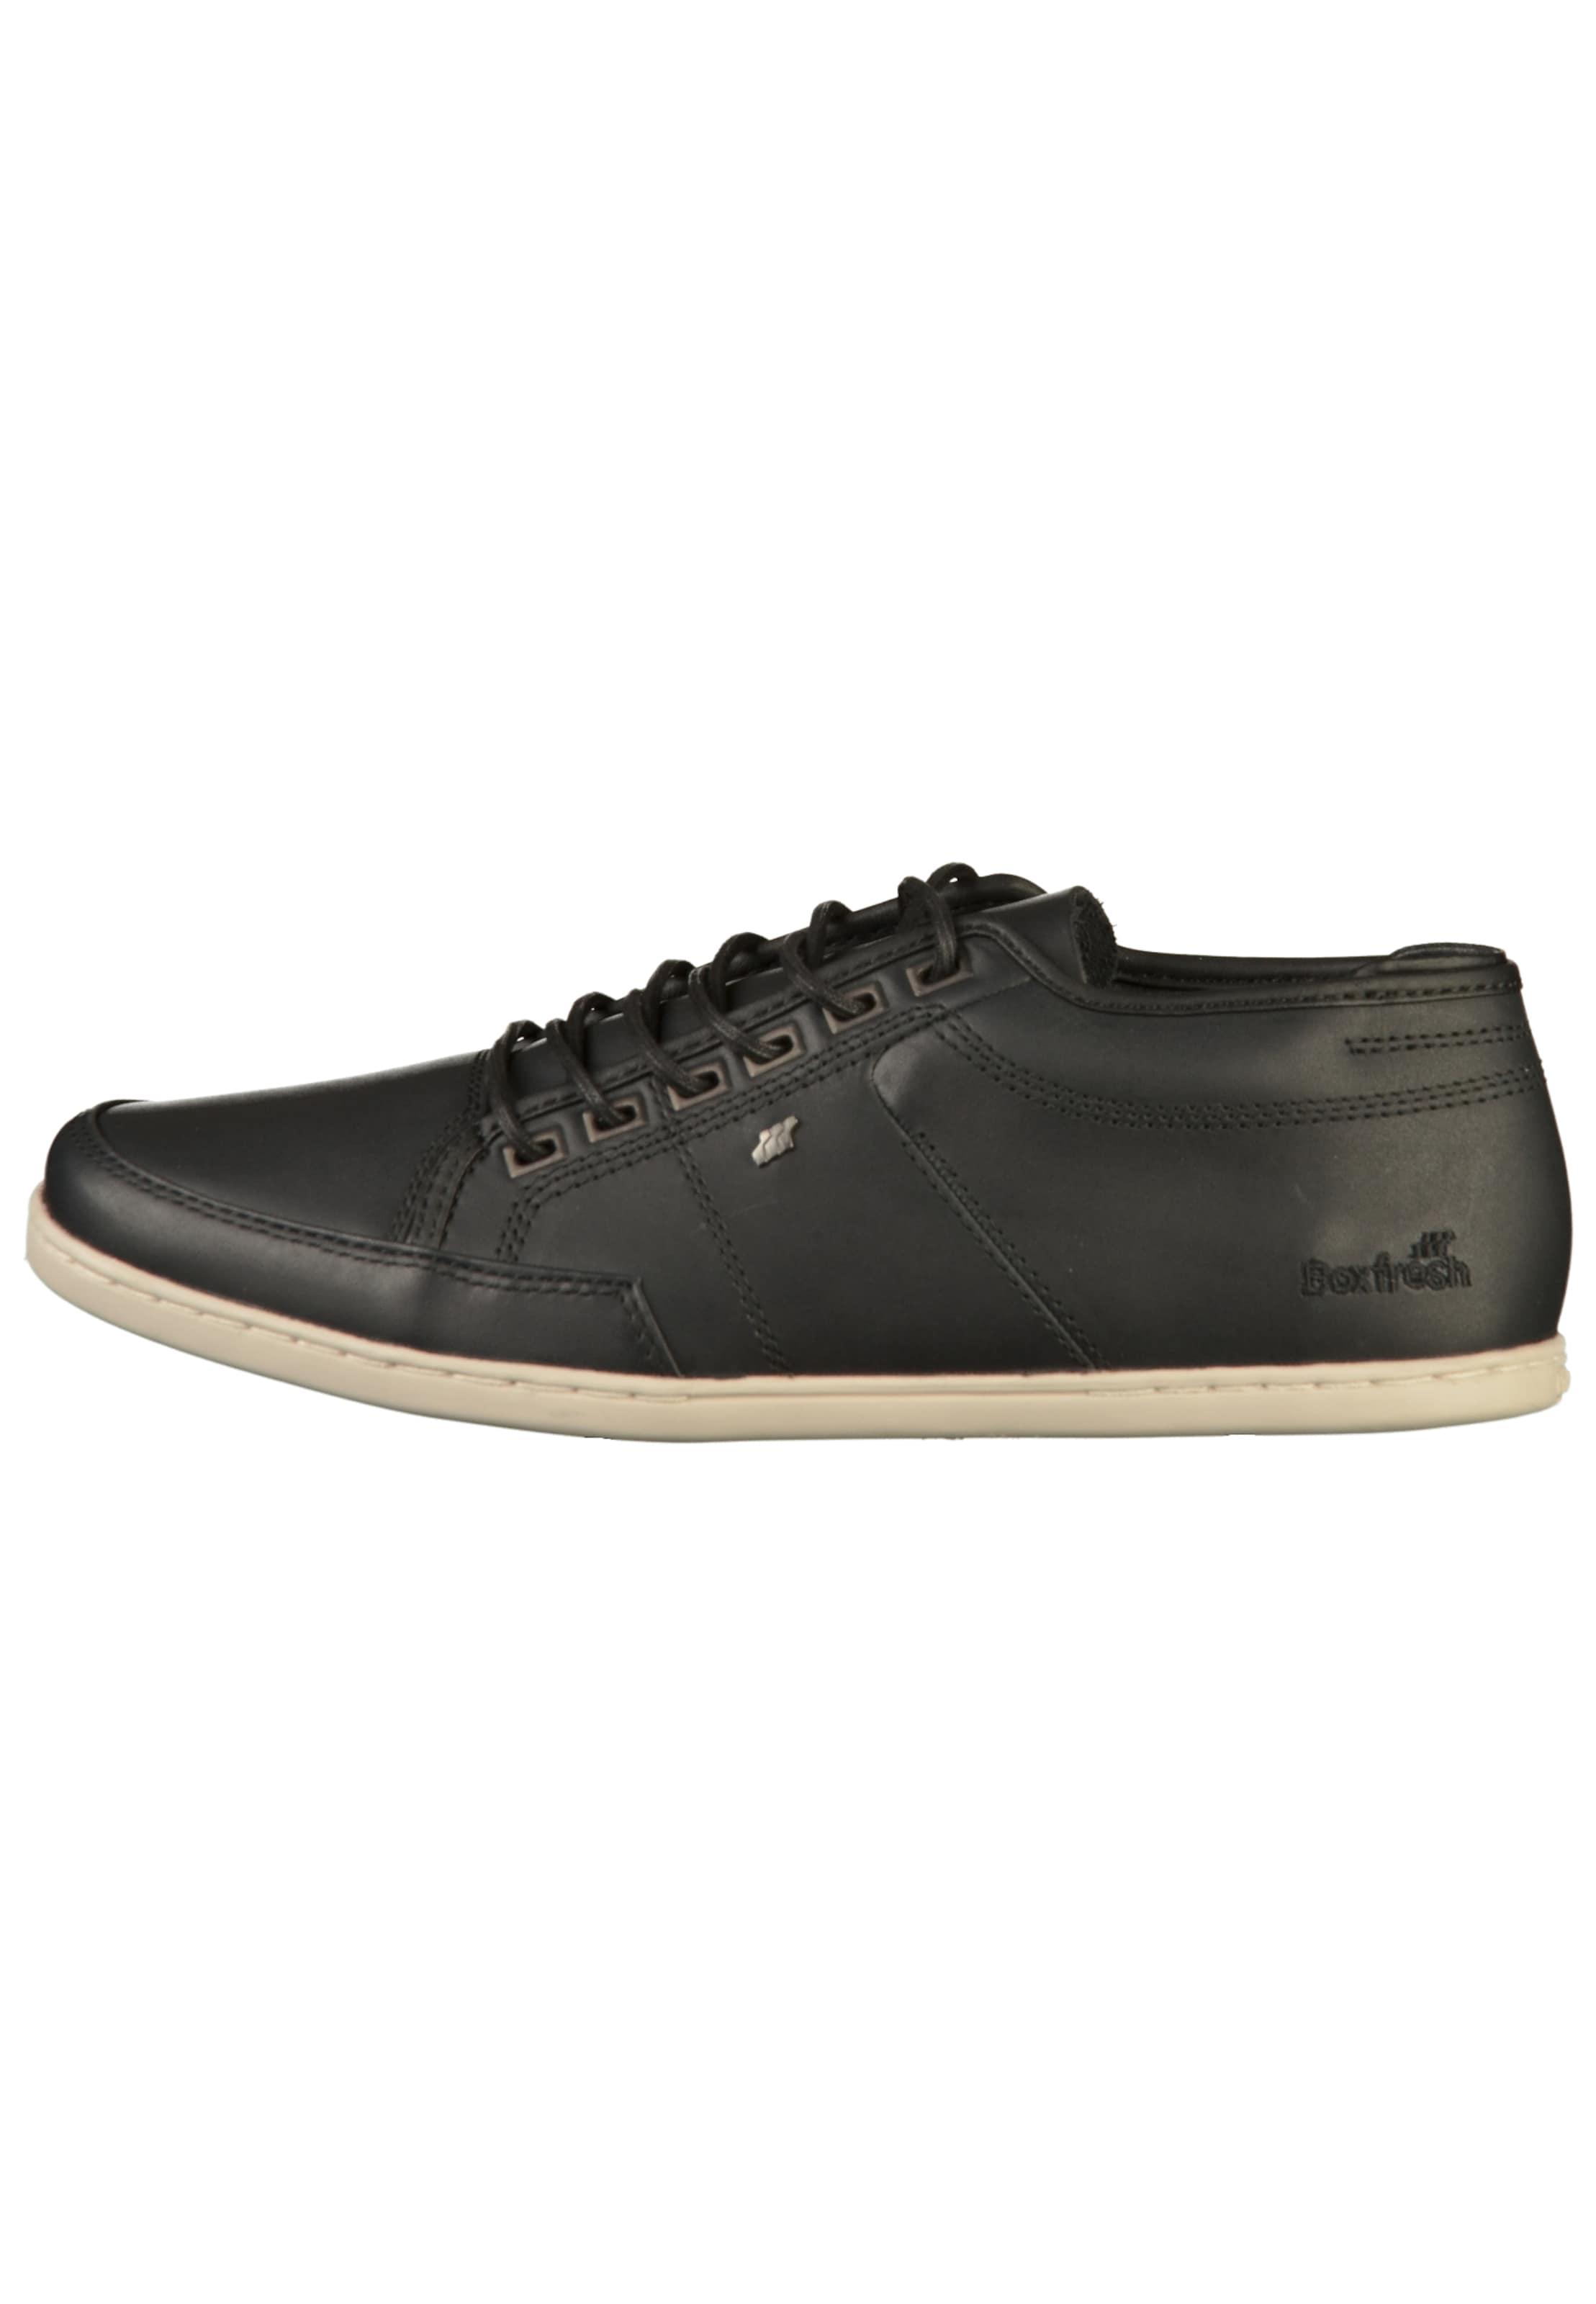 Boxfresh Sneakers 'sparko' 'sparko' Sneakers Boxfresh Schwarz In vby6Yf7g